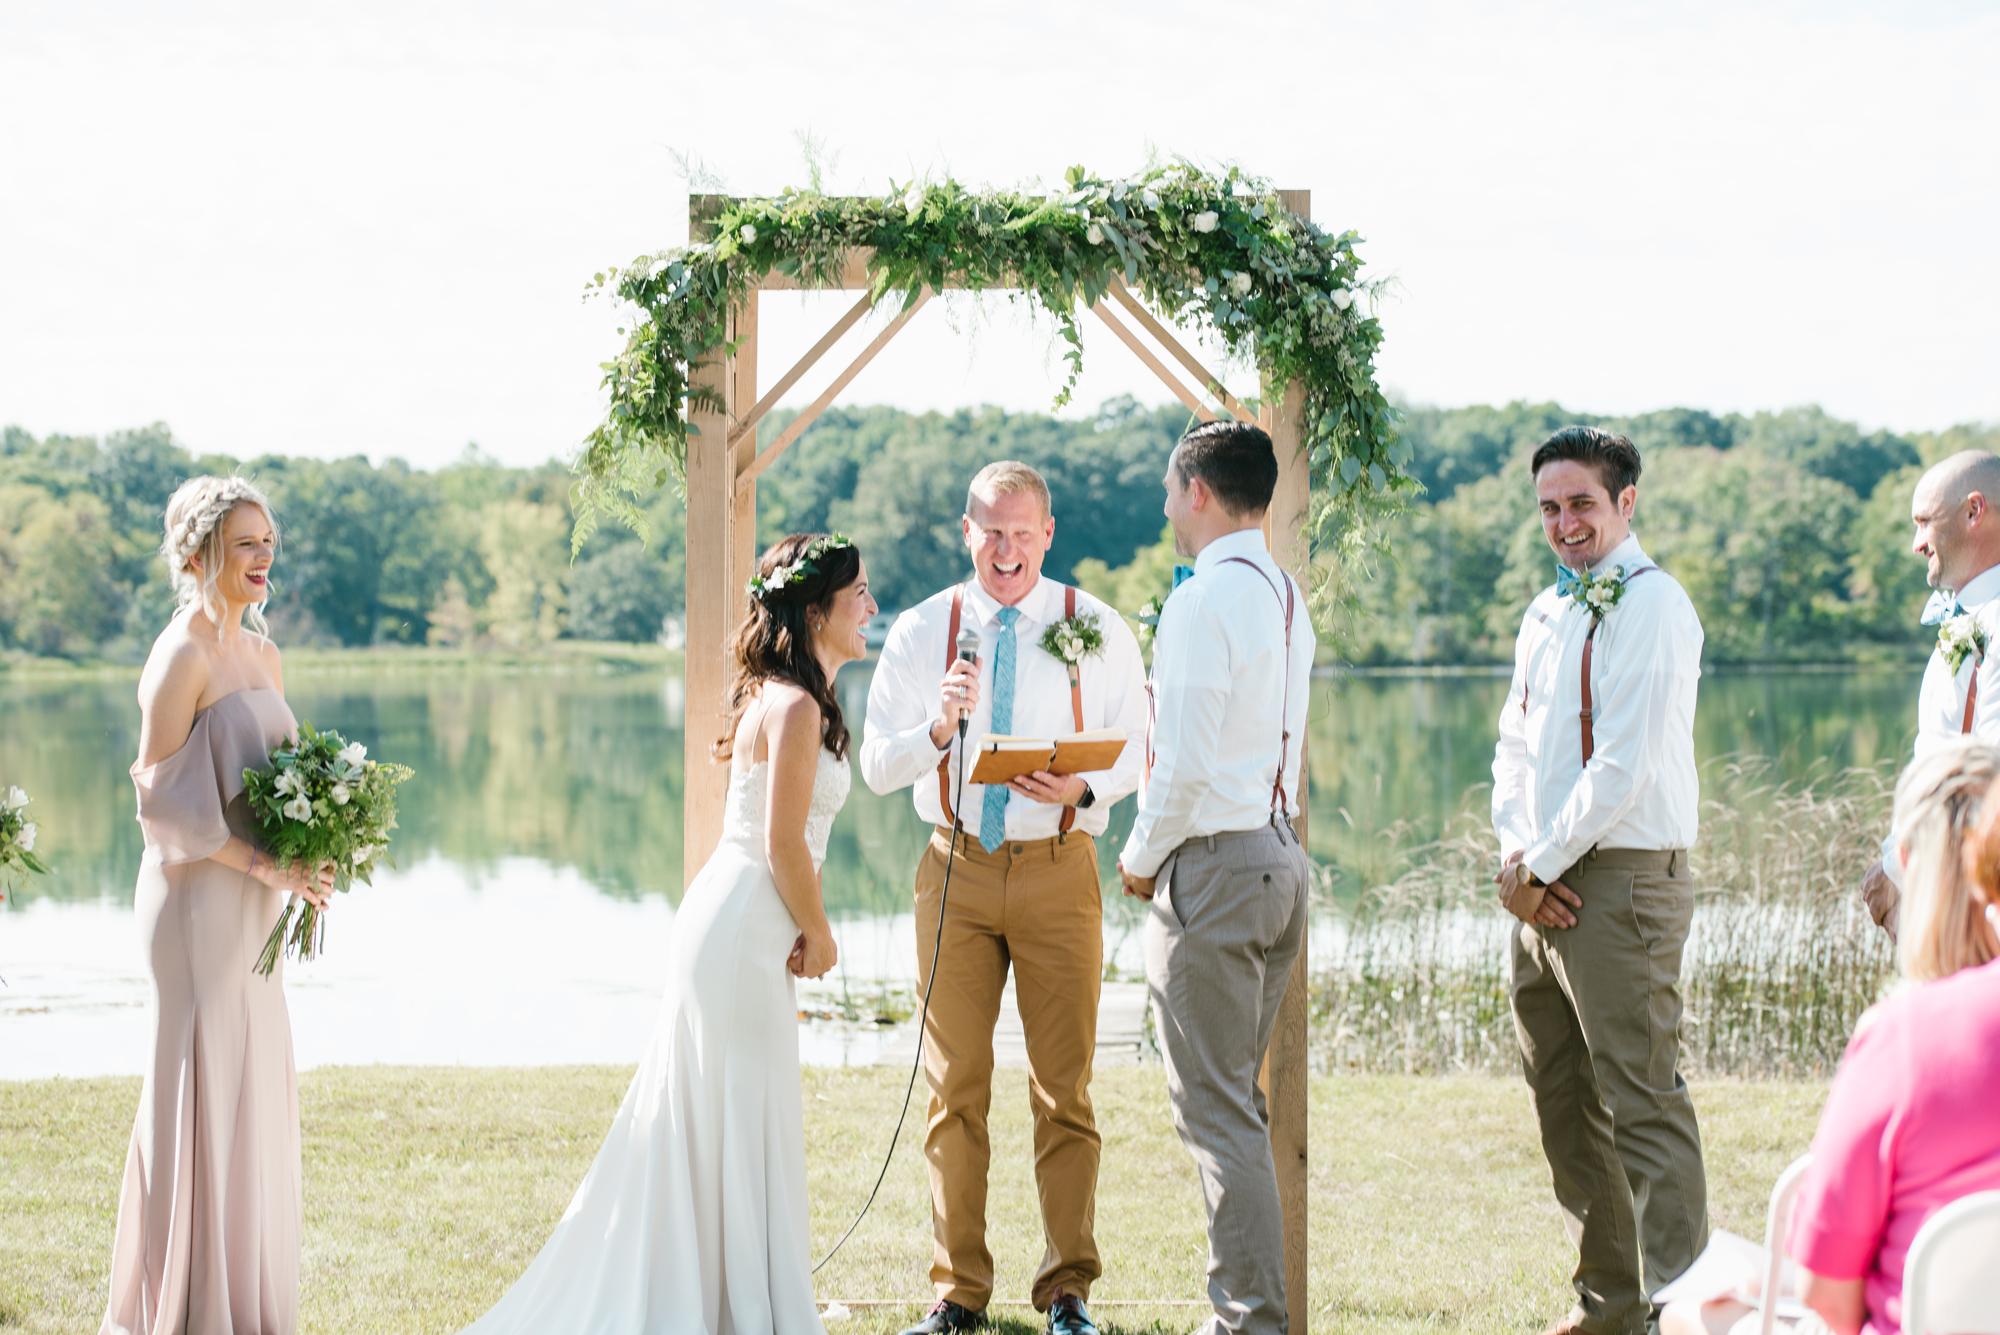 Quincy-Coldwater-Michigan-farm-wedding-photogapher-sydney-marie (170).jpg